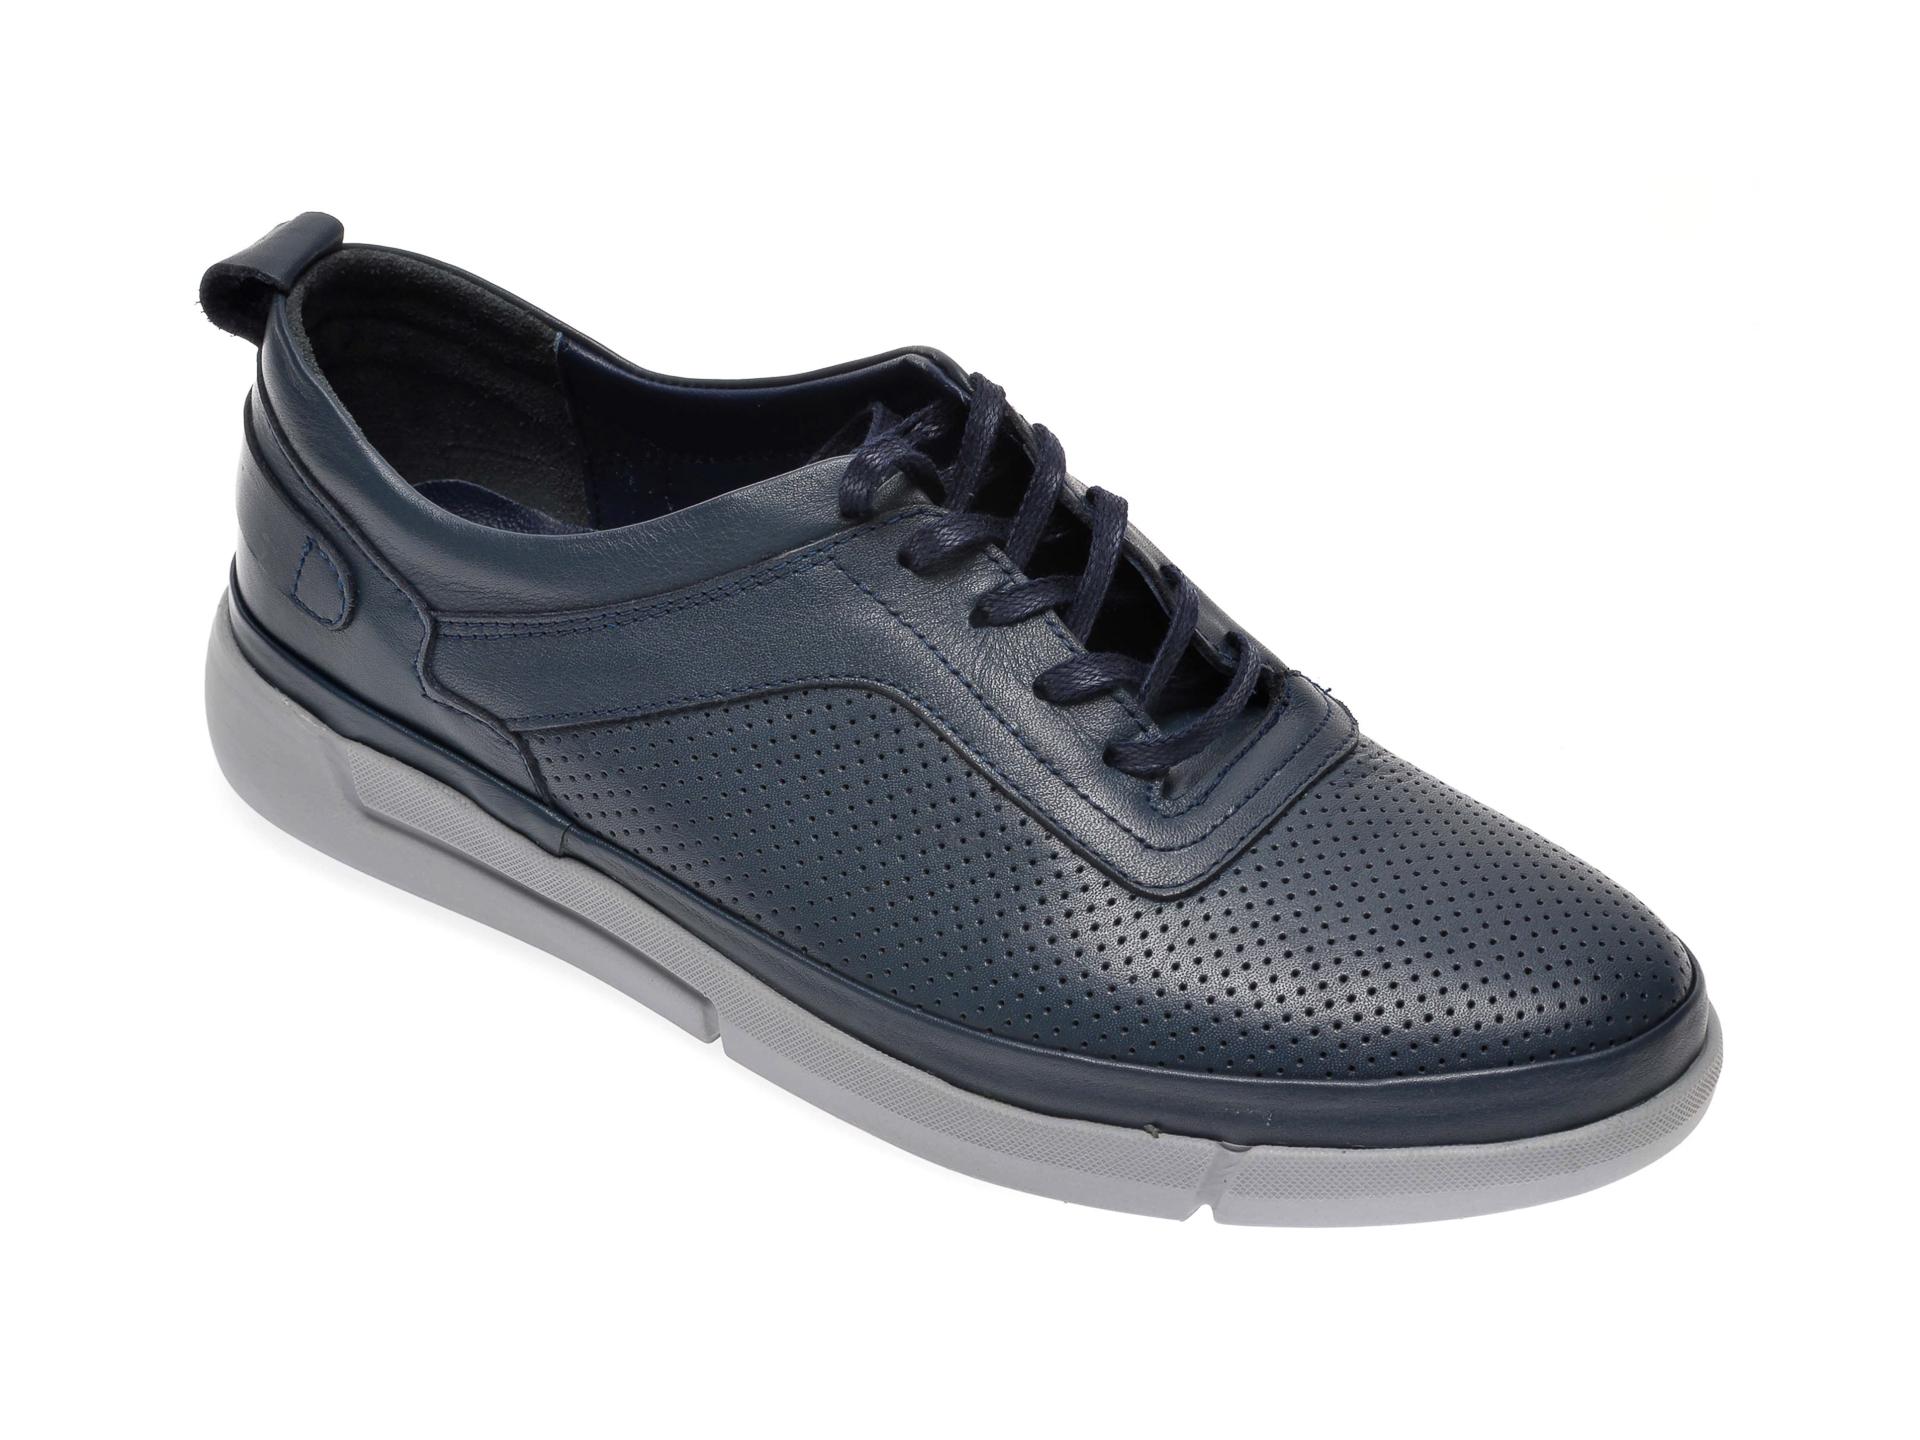 Pantofi OTTER bleumarin, 402, din piele naturala